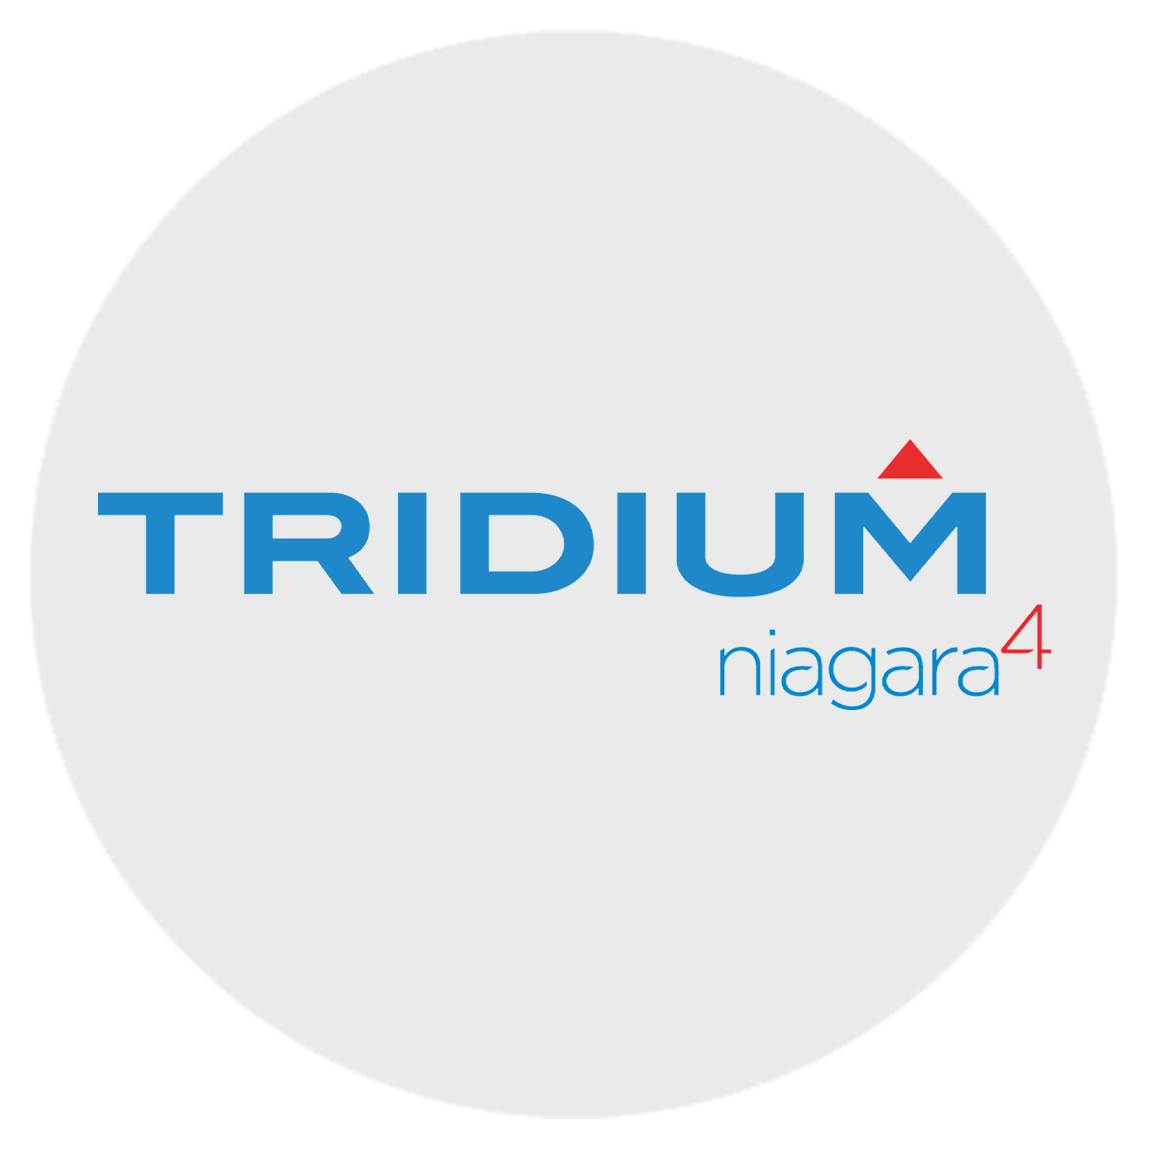 http://walterscontrols.net/wp-content/uploads/2020/01/tridium.png